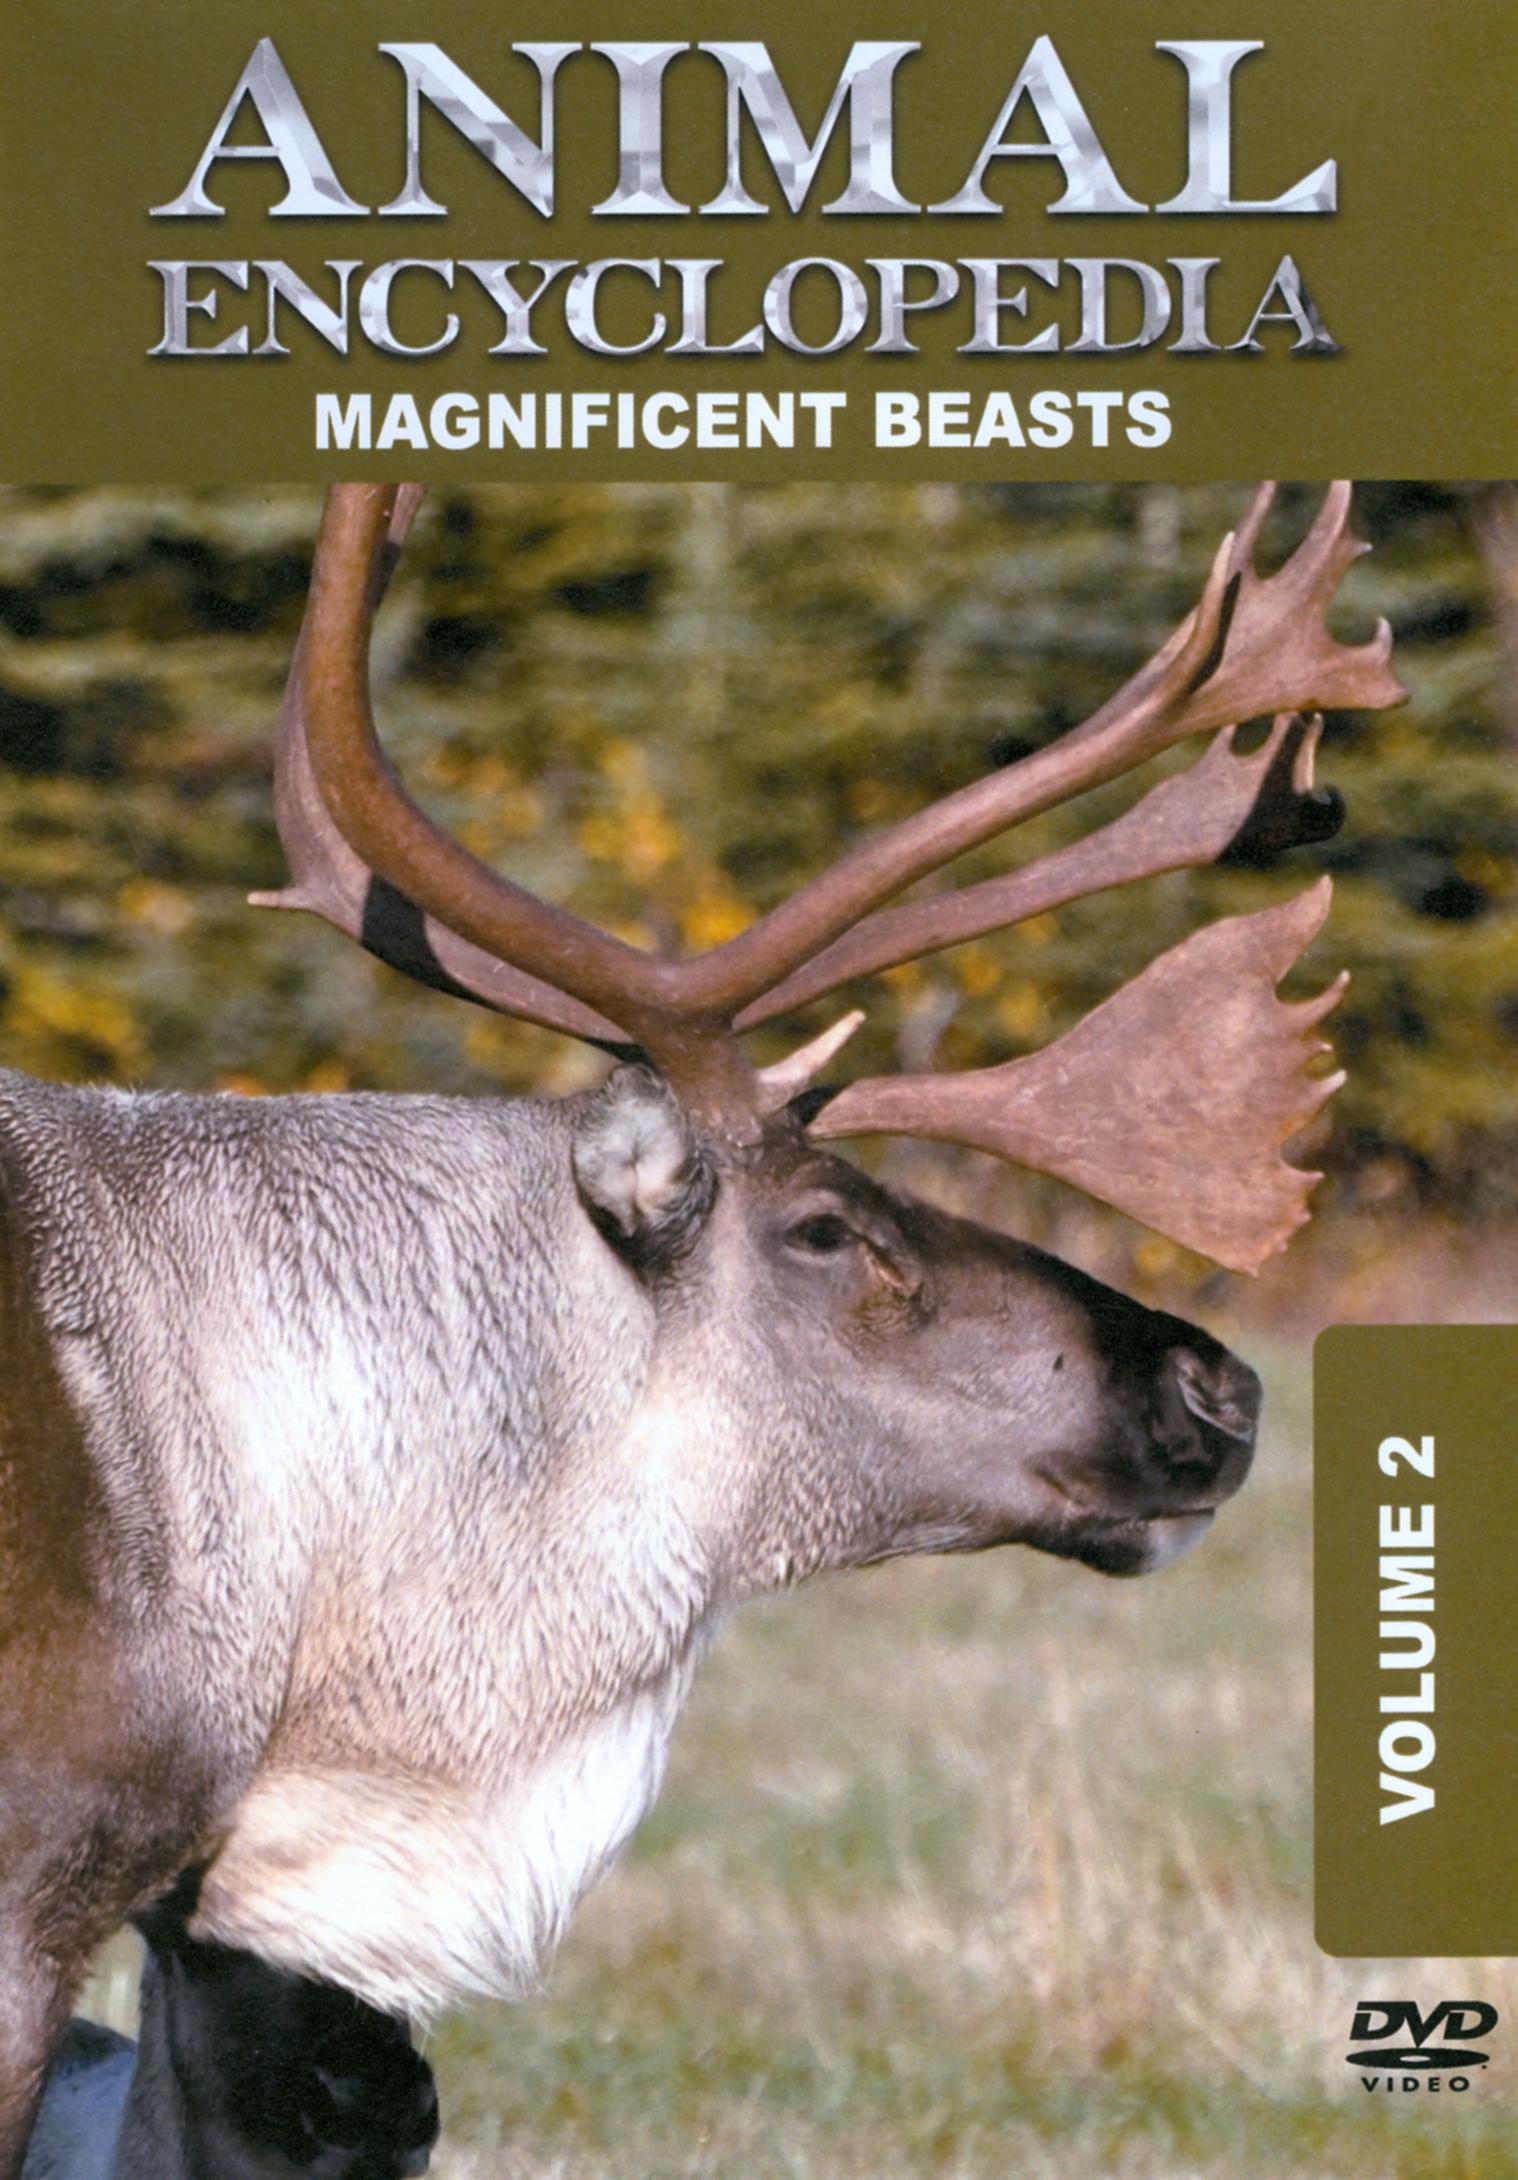 Animal Encyclopedia, Vol. 2: Magnificent Beasts